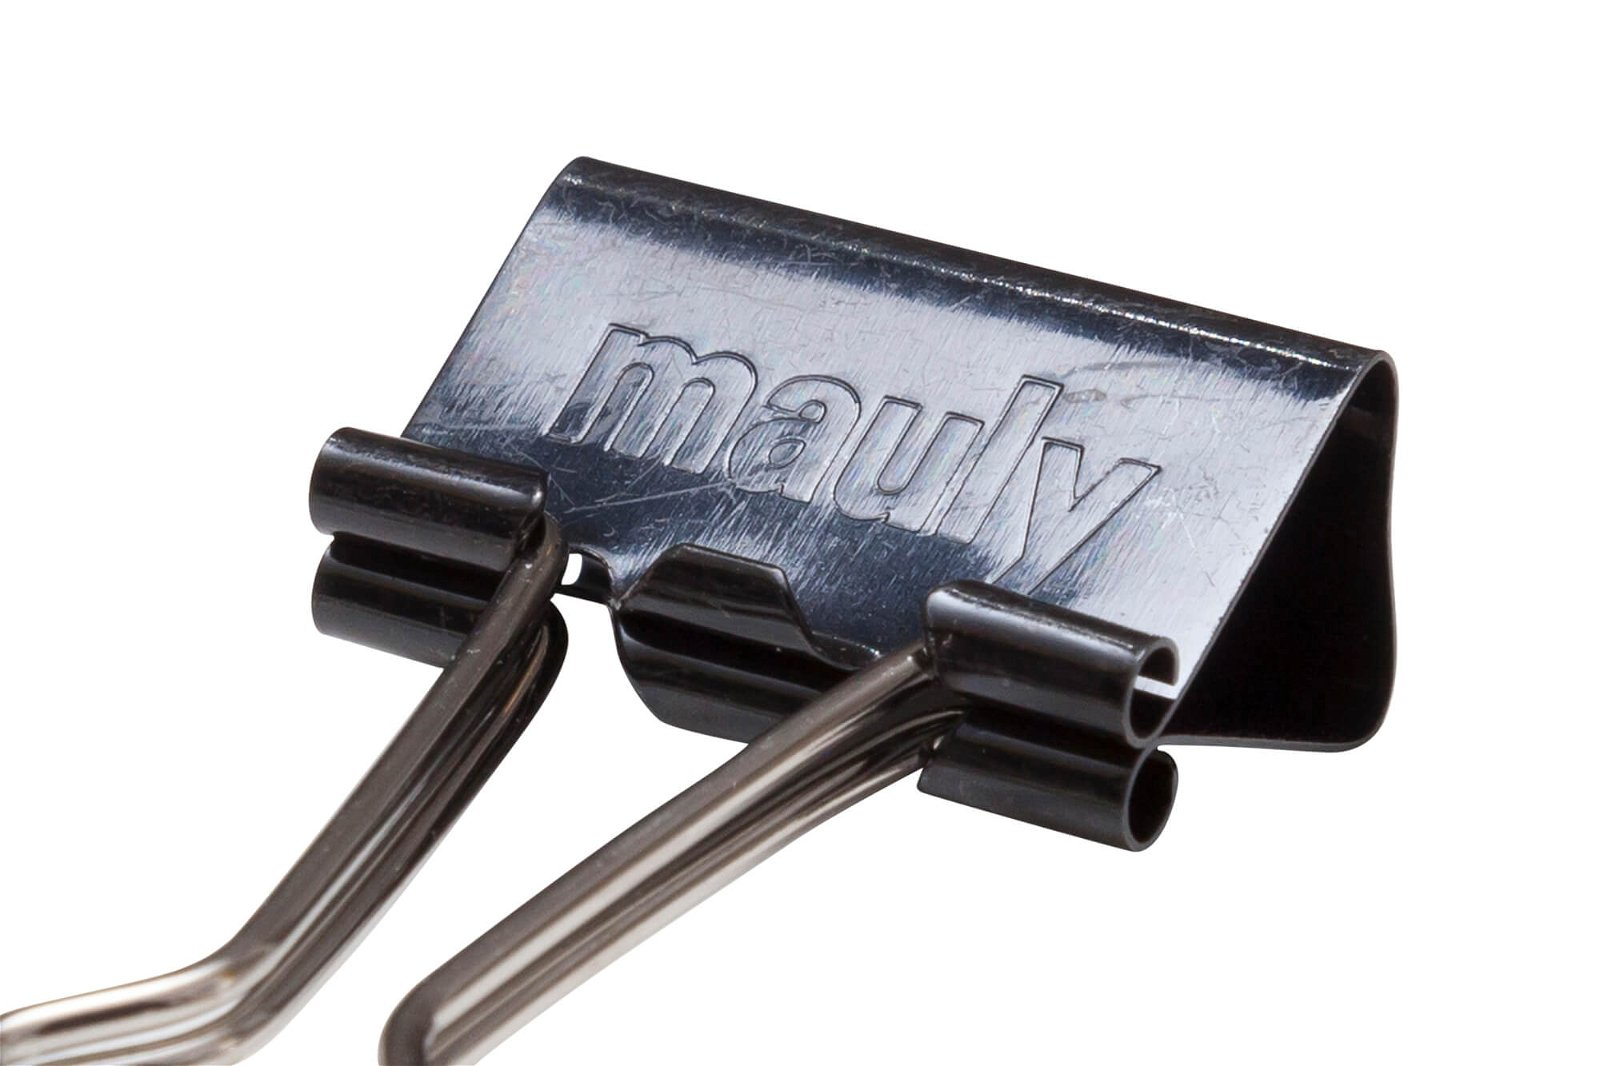 mauly 215, Breite 25 mm, 12 St./Btl., schwarz